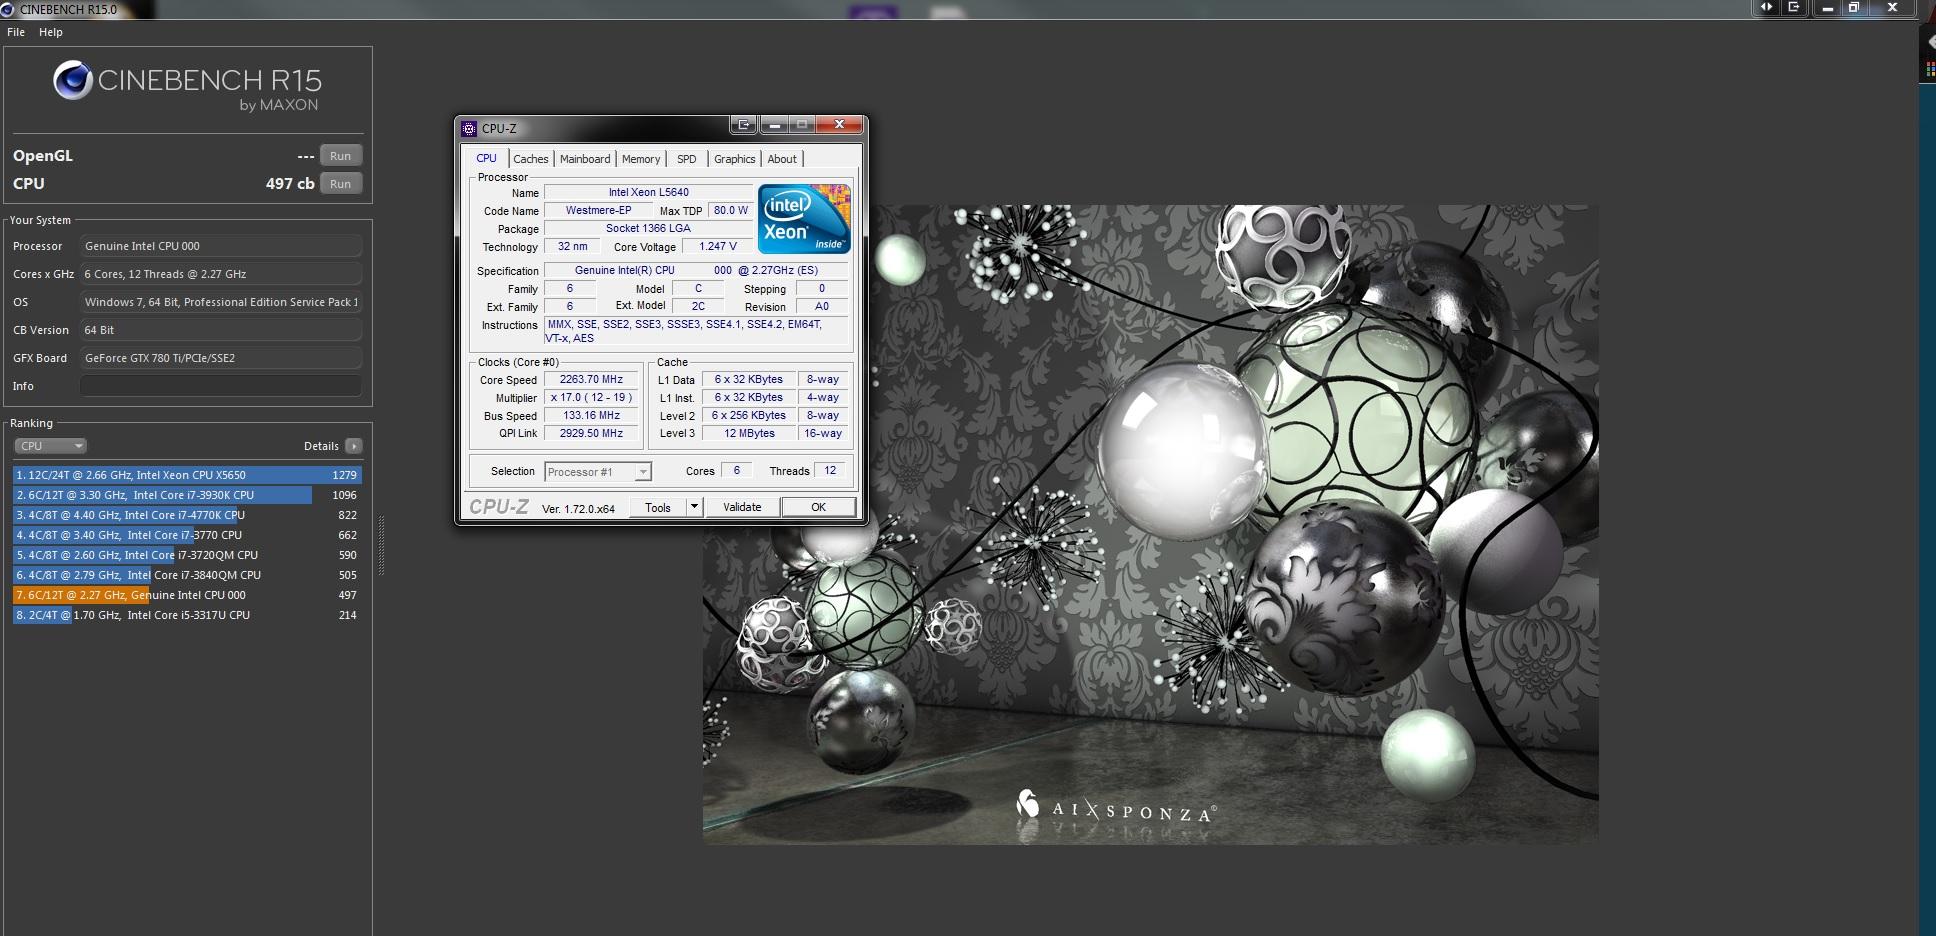 Valgaur`s Cinebench - R15 score: 497 cb with a Xeon L5640